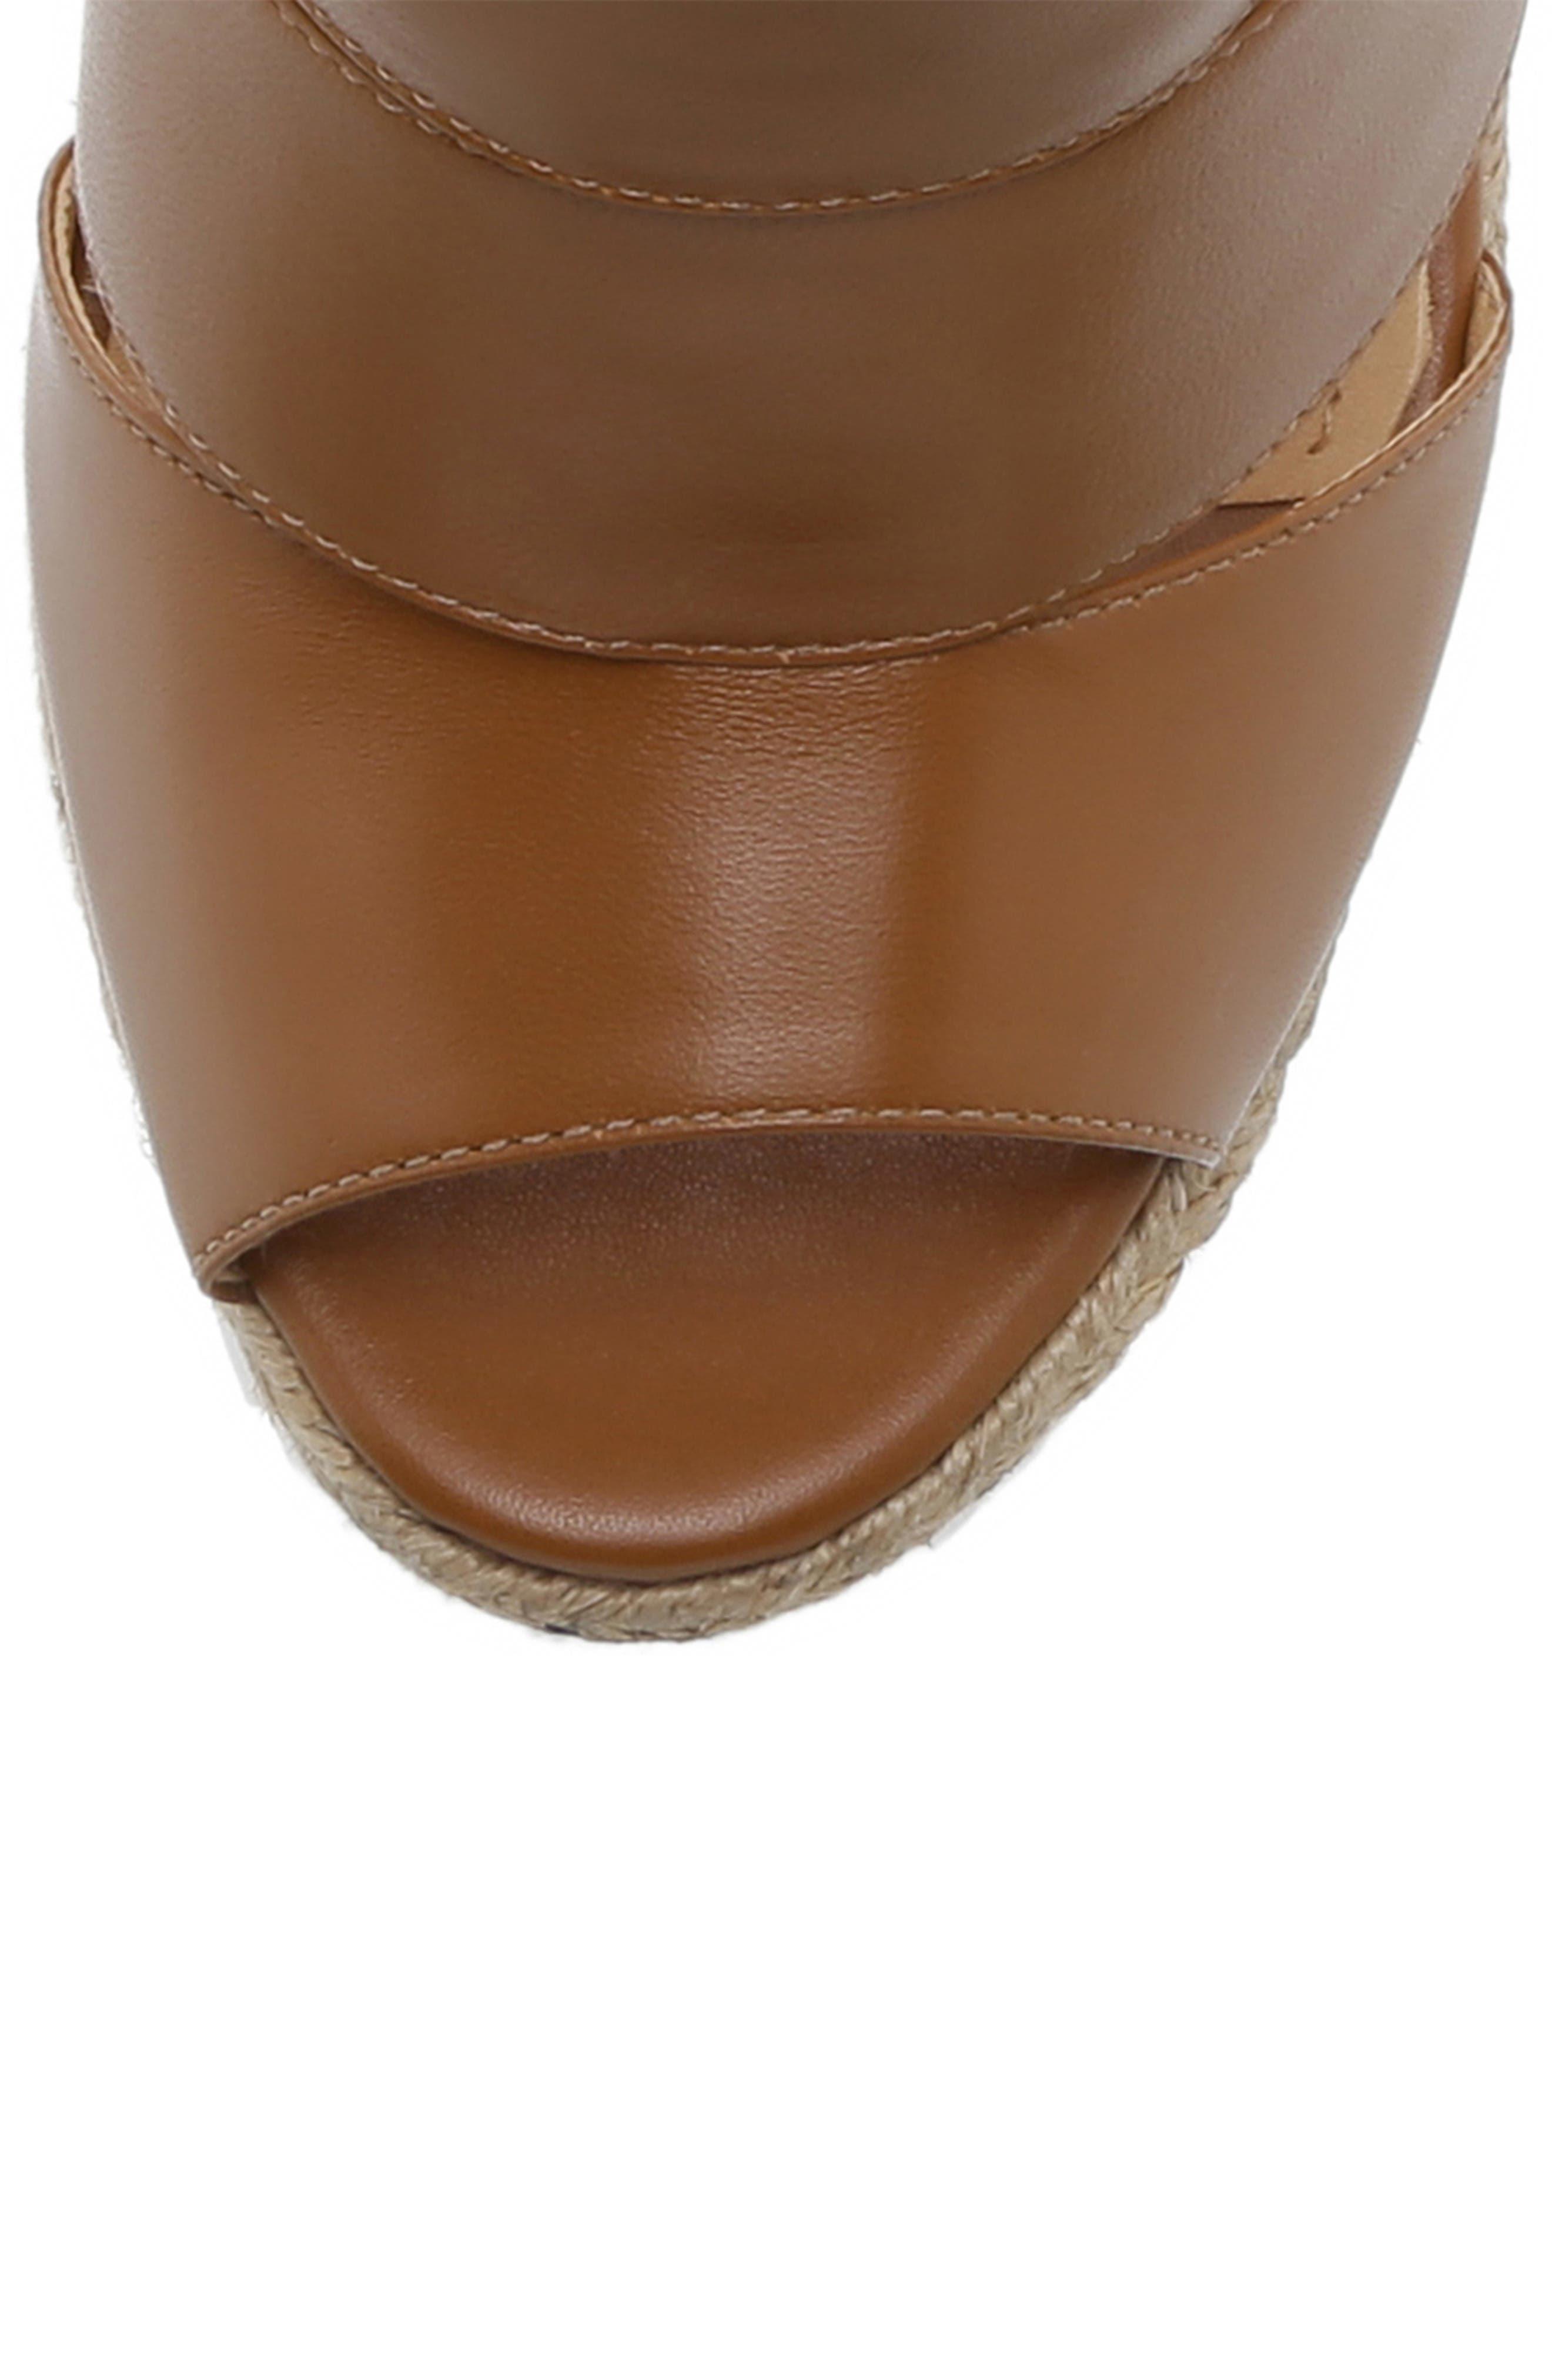 Ilione Platform Wedge Sandal,                             Alternate thumbnail 5, color,                             WOOD LEATHER